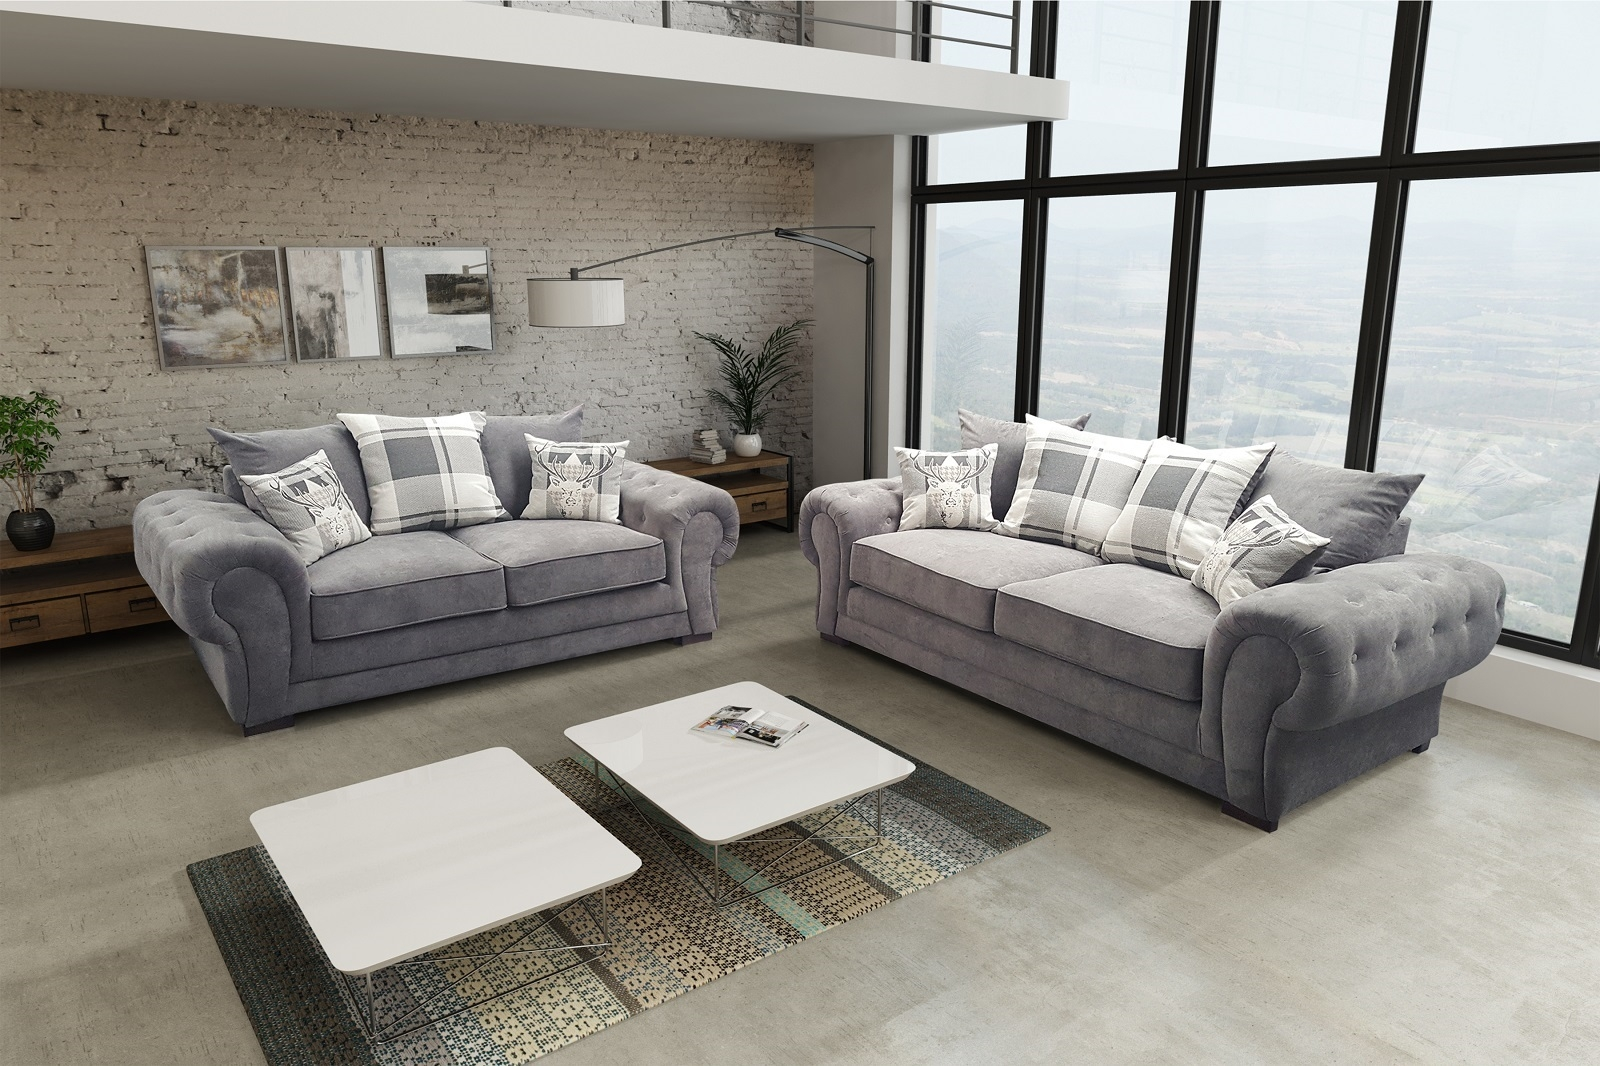 New Verona Sofa Set 3 2 Seater Fabric Dark Grey Ebay